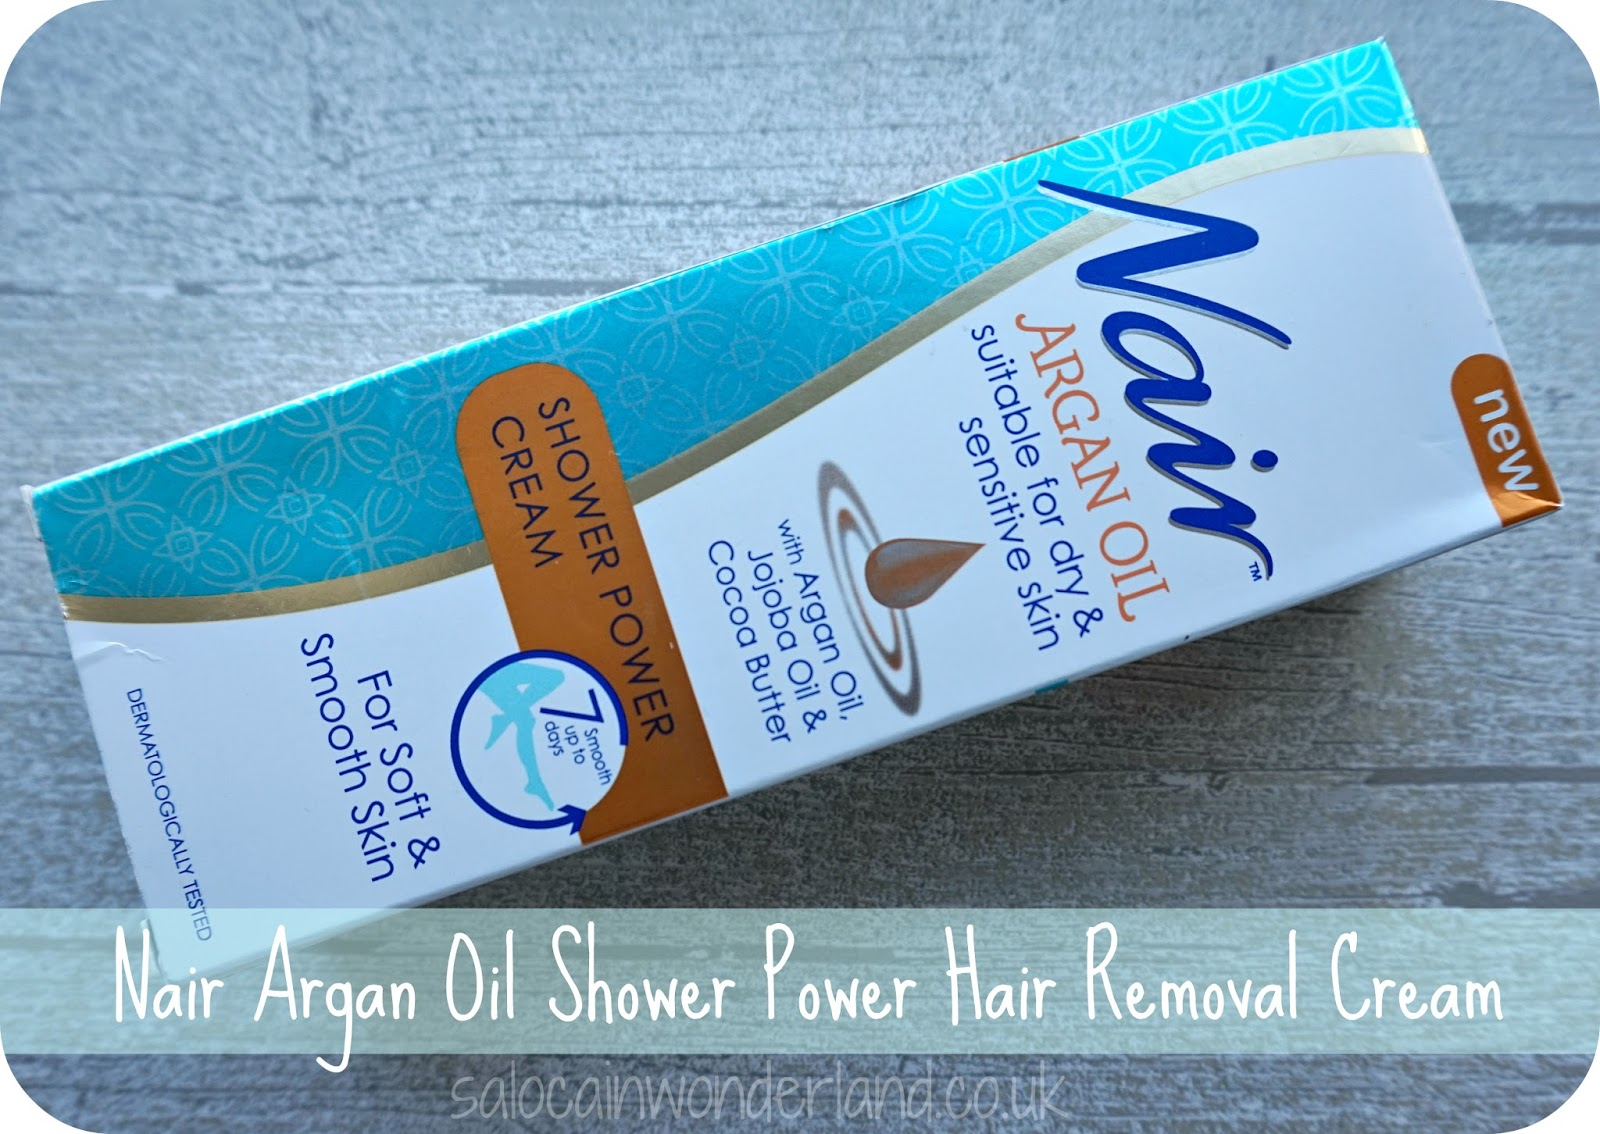 Saloca In Wonderland Nair Argan Oil Shower Power Hair Removal Cream Review